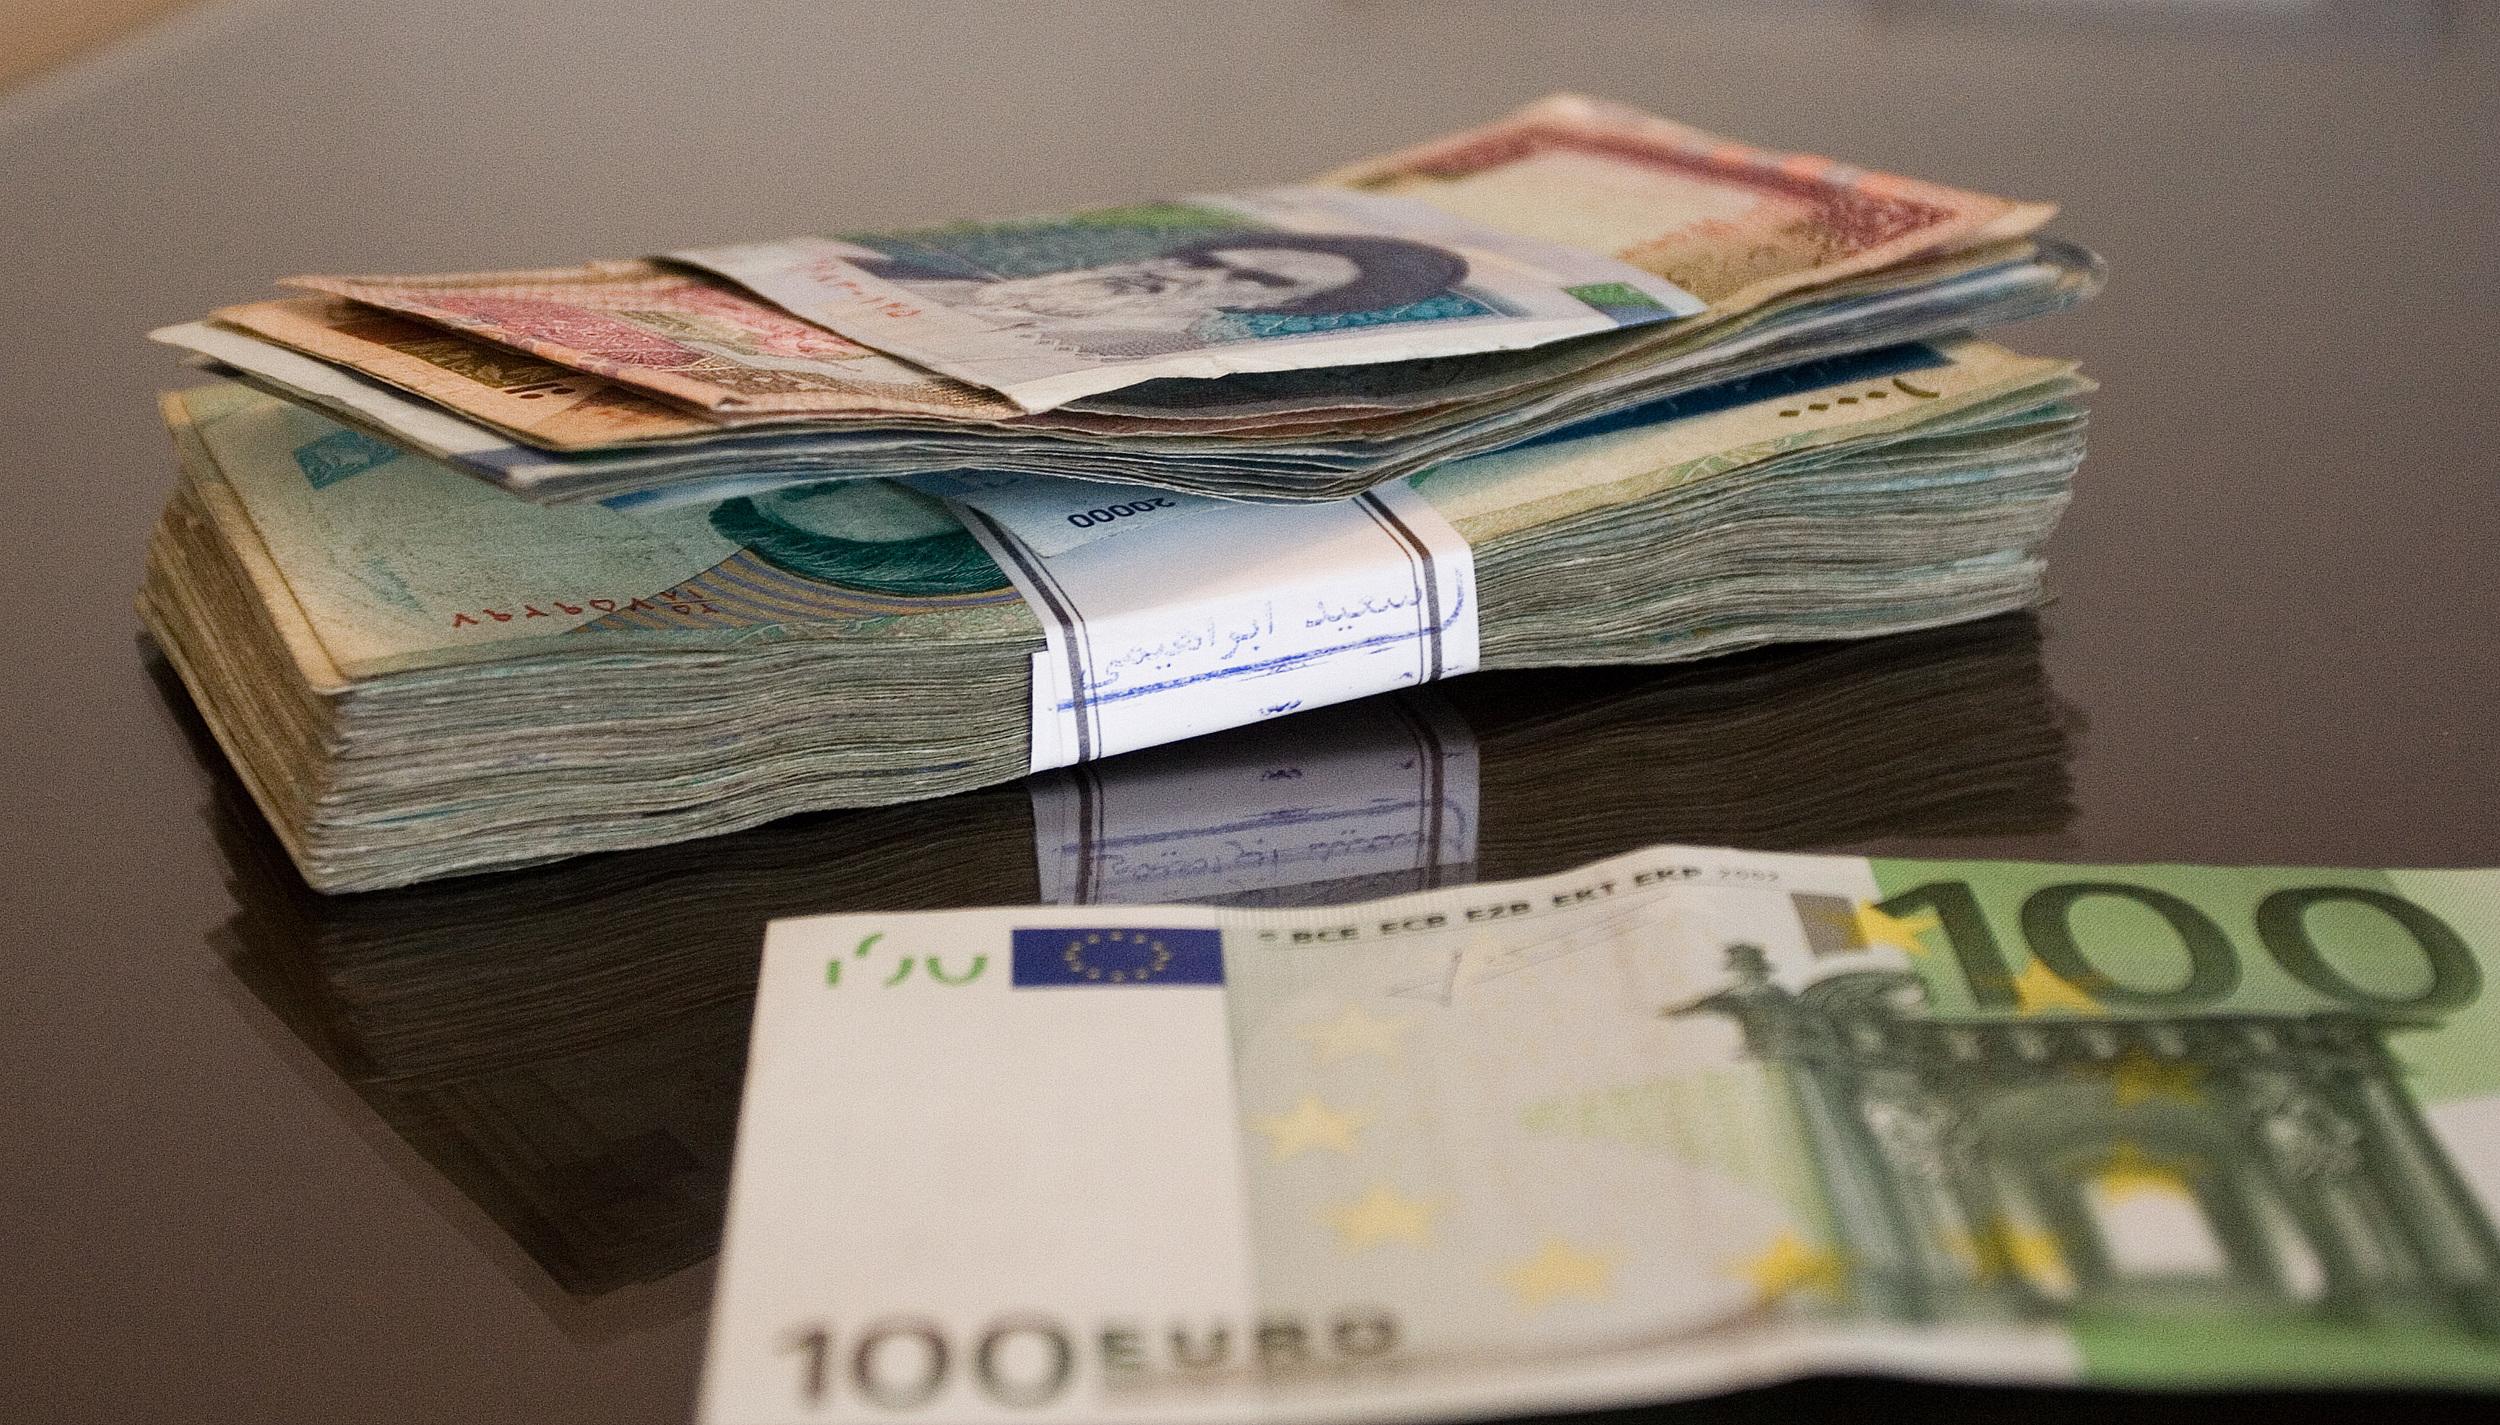 Had a delayed flight in the past 11 years? You could be entitled to some cash. Image credit:    Ivar Husevåg Døskeland   /Flickr